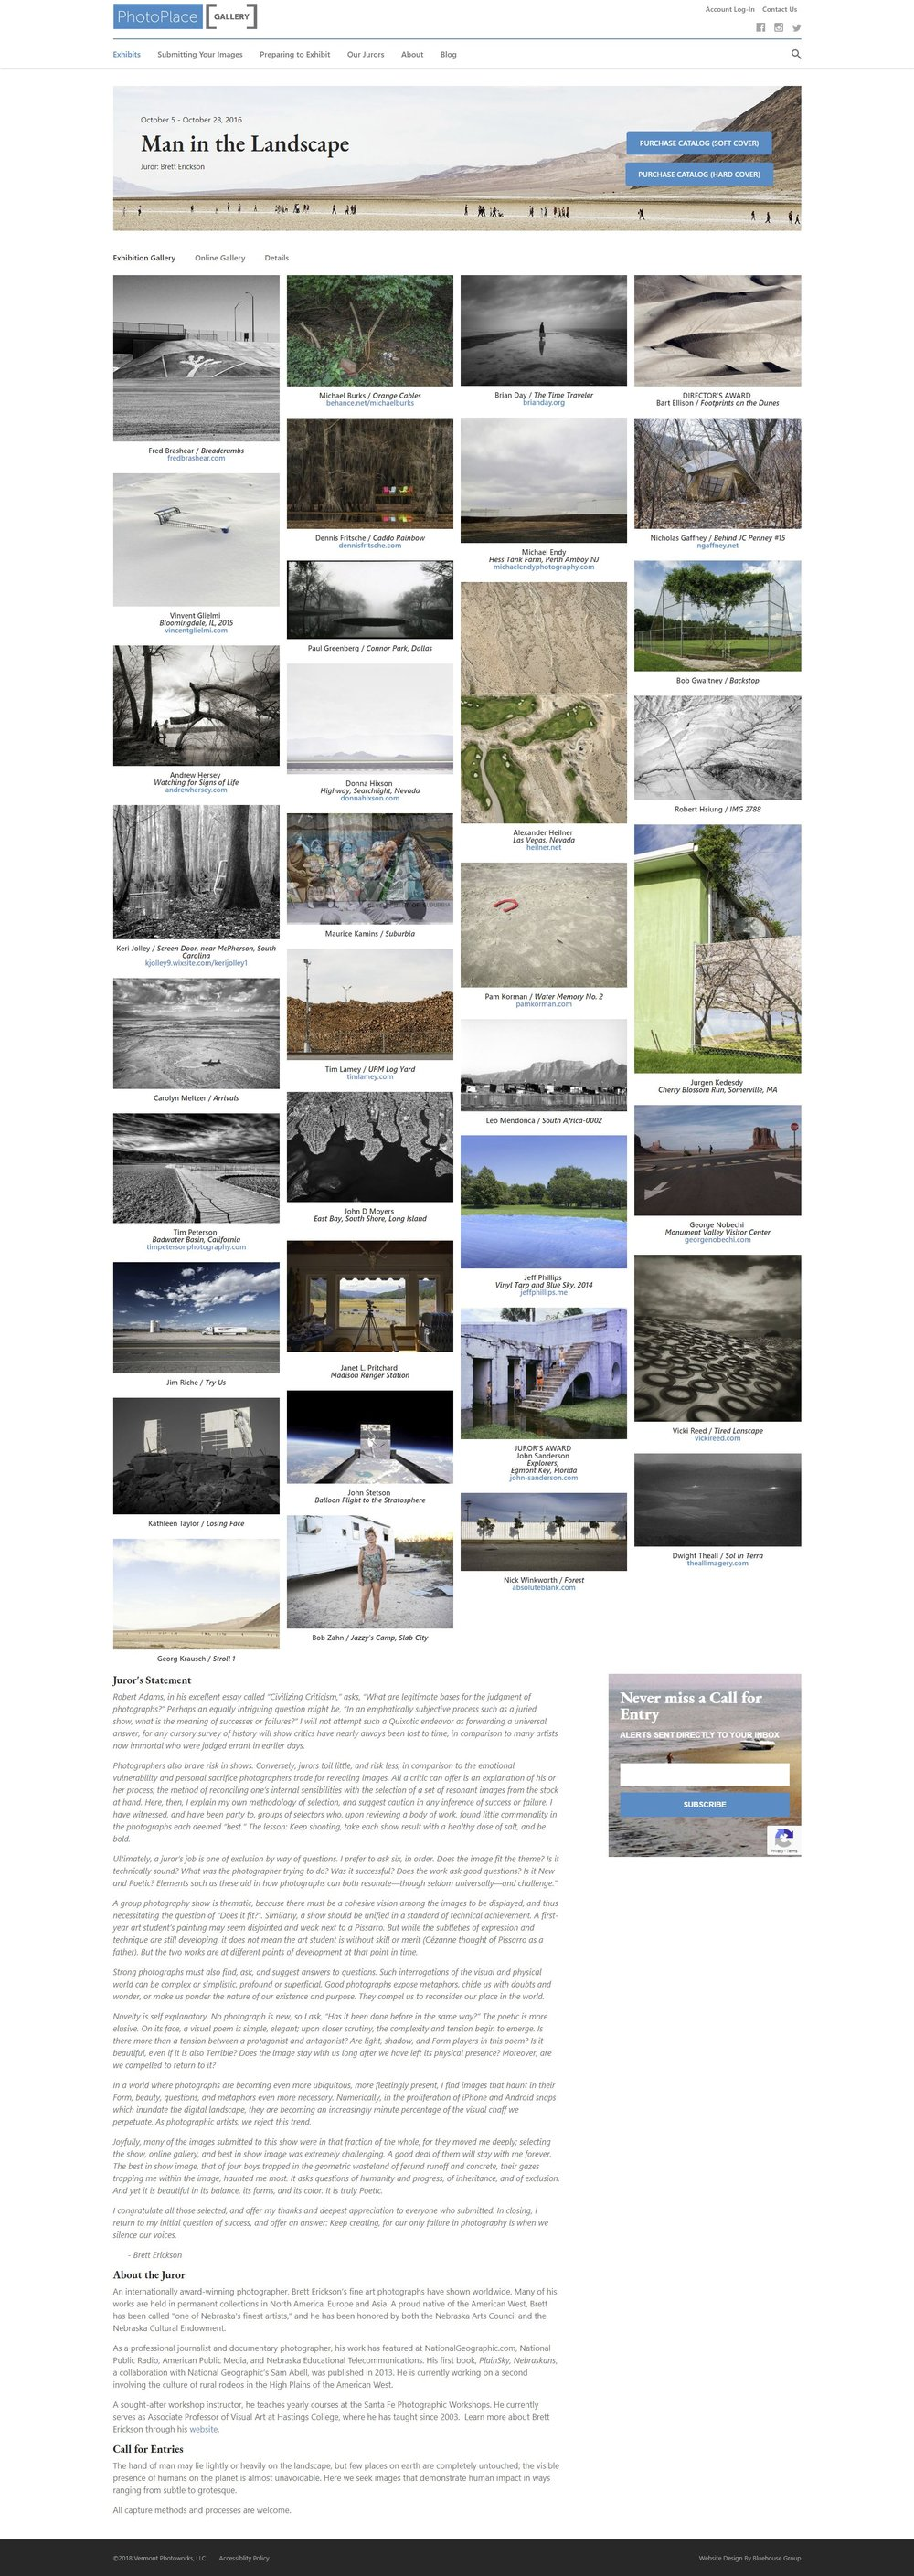 September 8 2017_Man in the Landscape (Juror's Choice Award – Brett L. Erickson)_PhotoPlace Gallery, Middlebury, VT.jpg